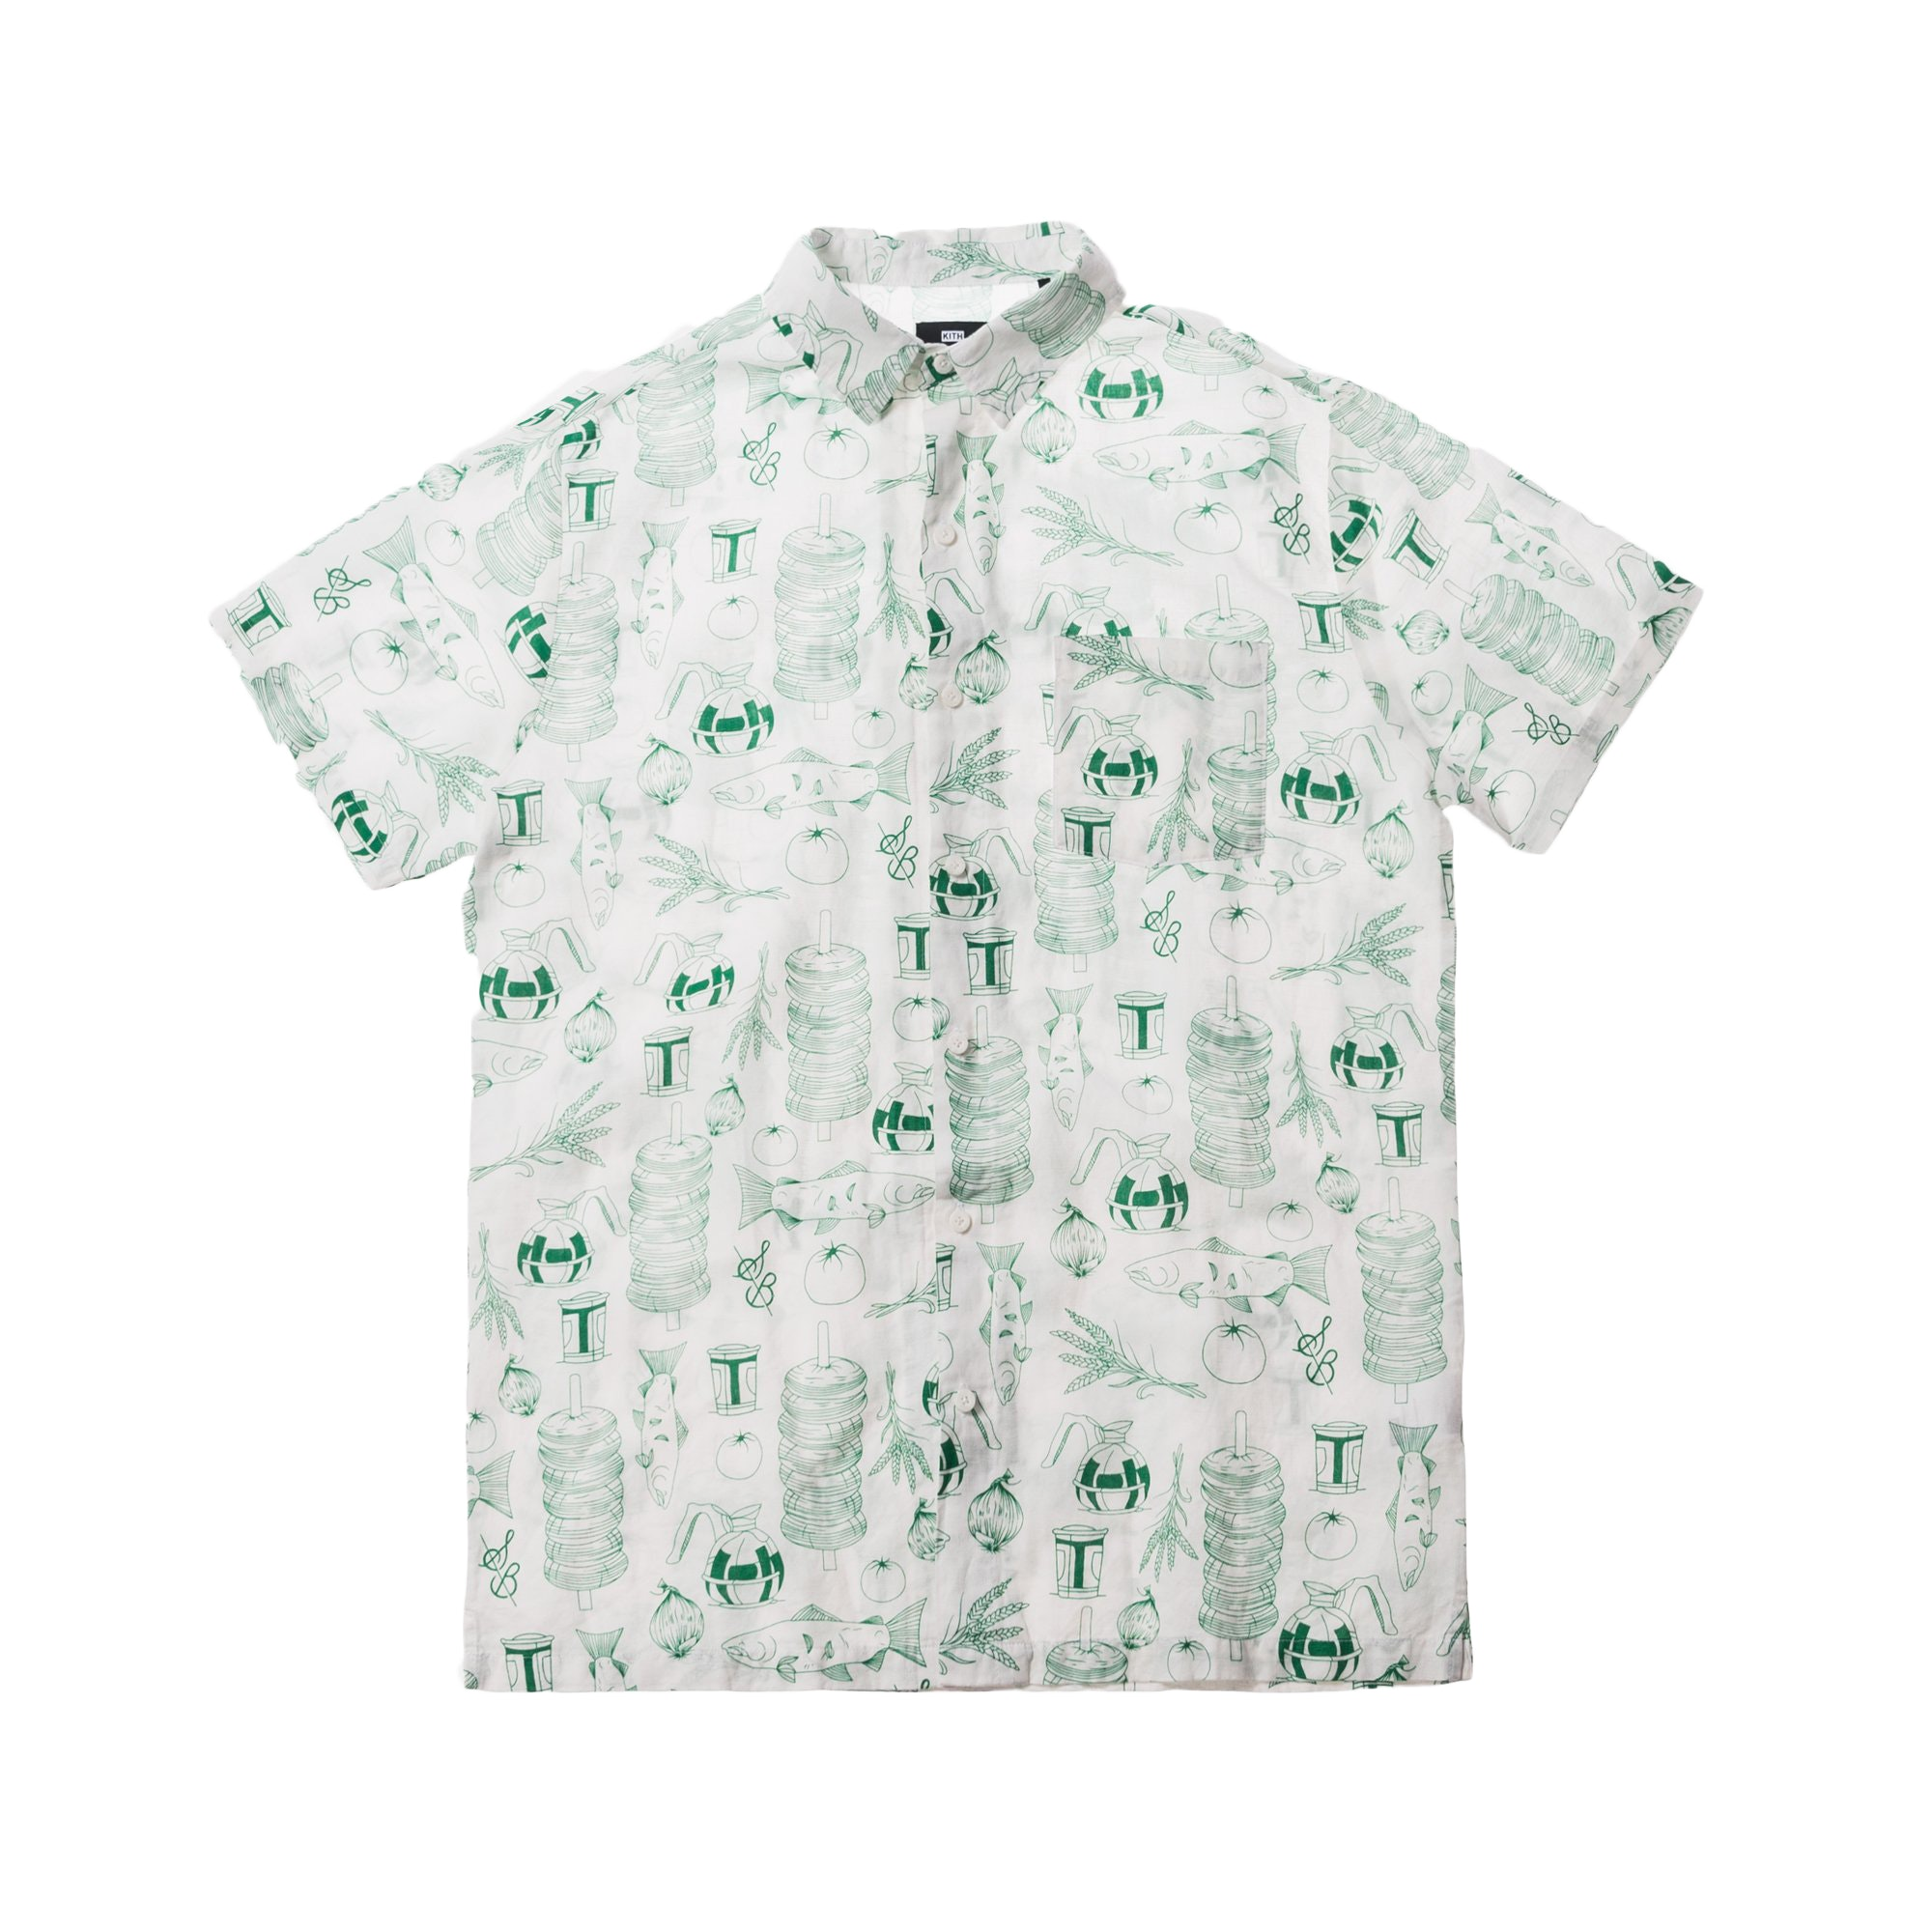 Kith x Sadelles All Over Hawaiian Button Up Multi